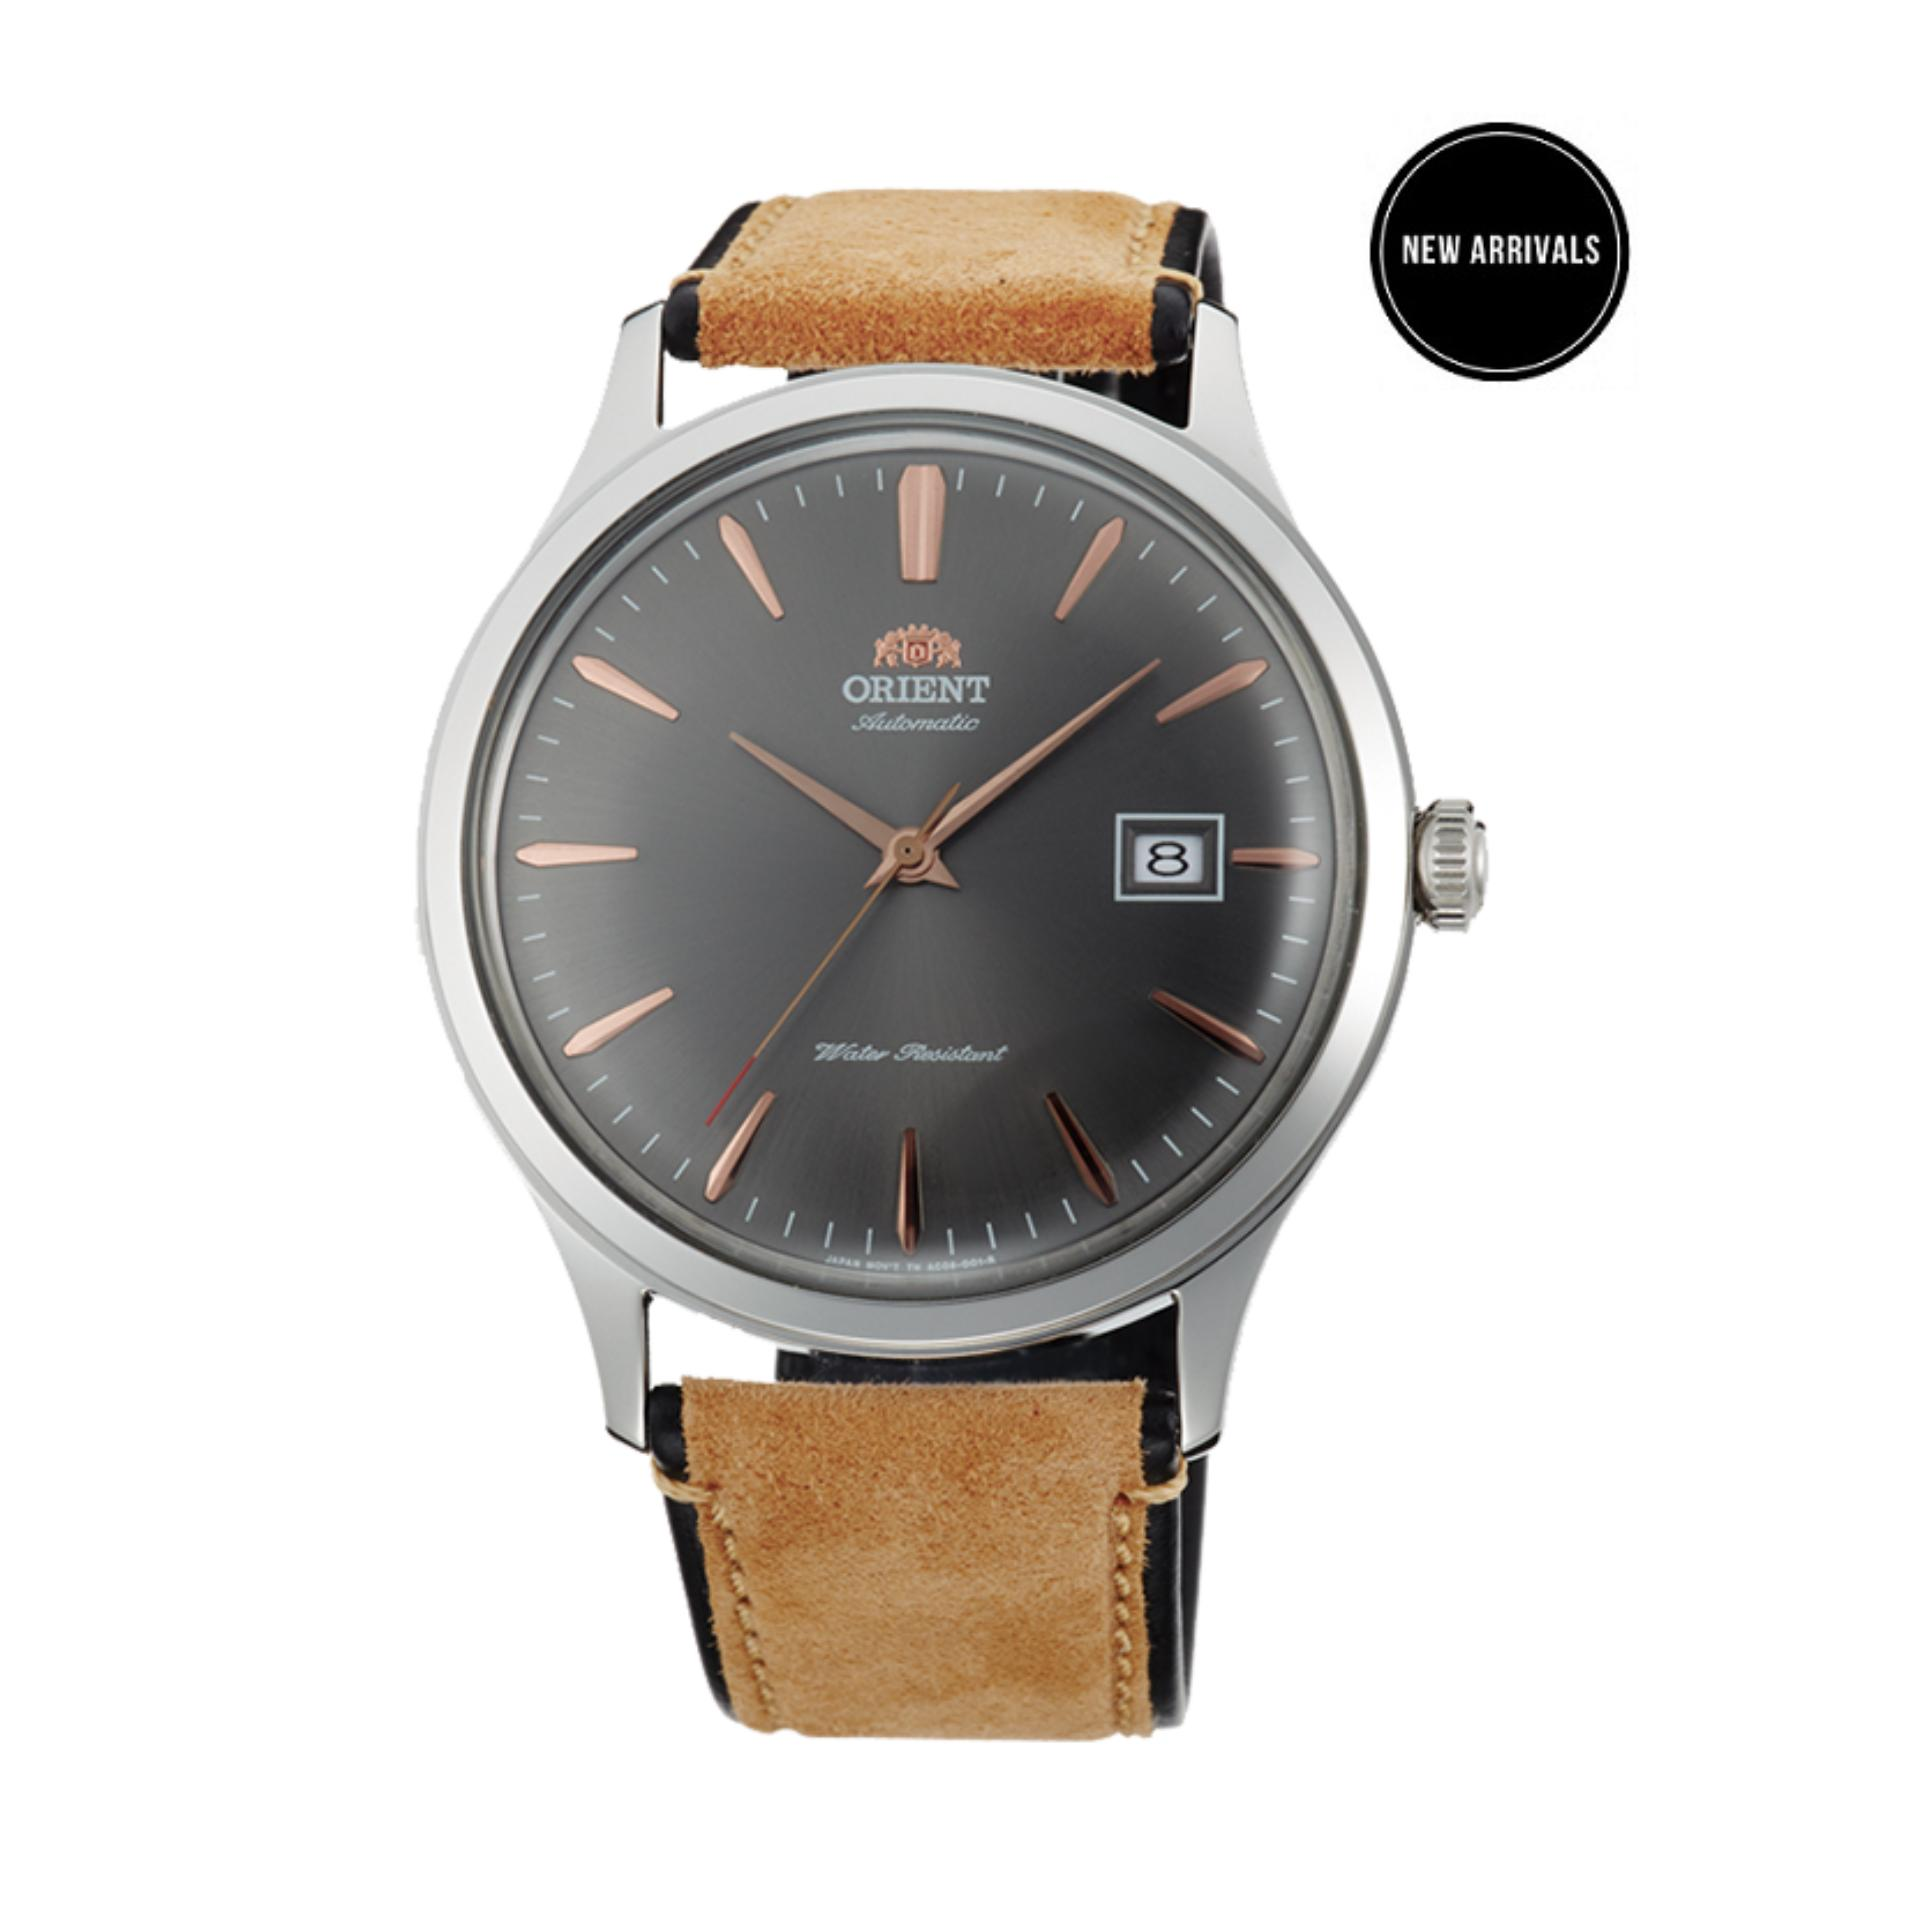 Đồng hồ nam dây da Orient Bambino Gen 4 FAC08003A0